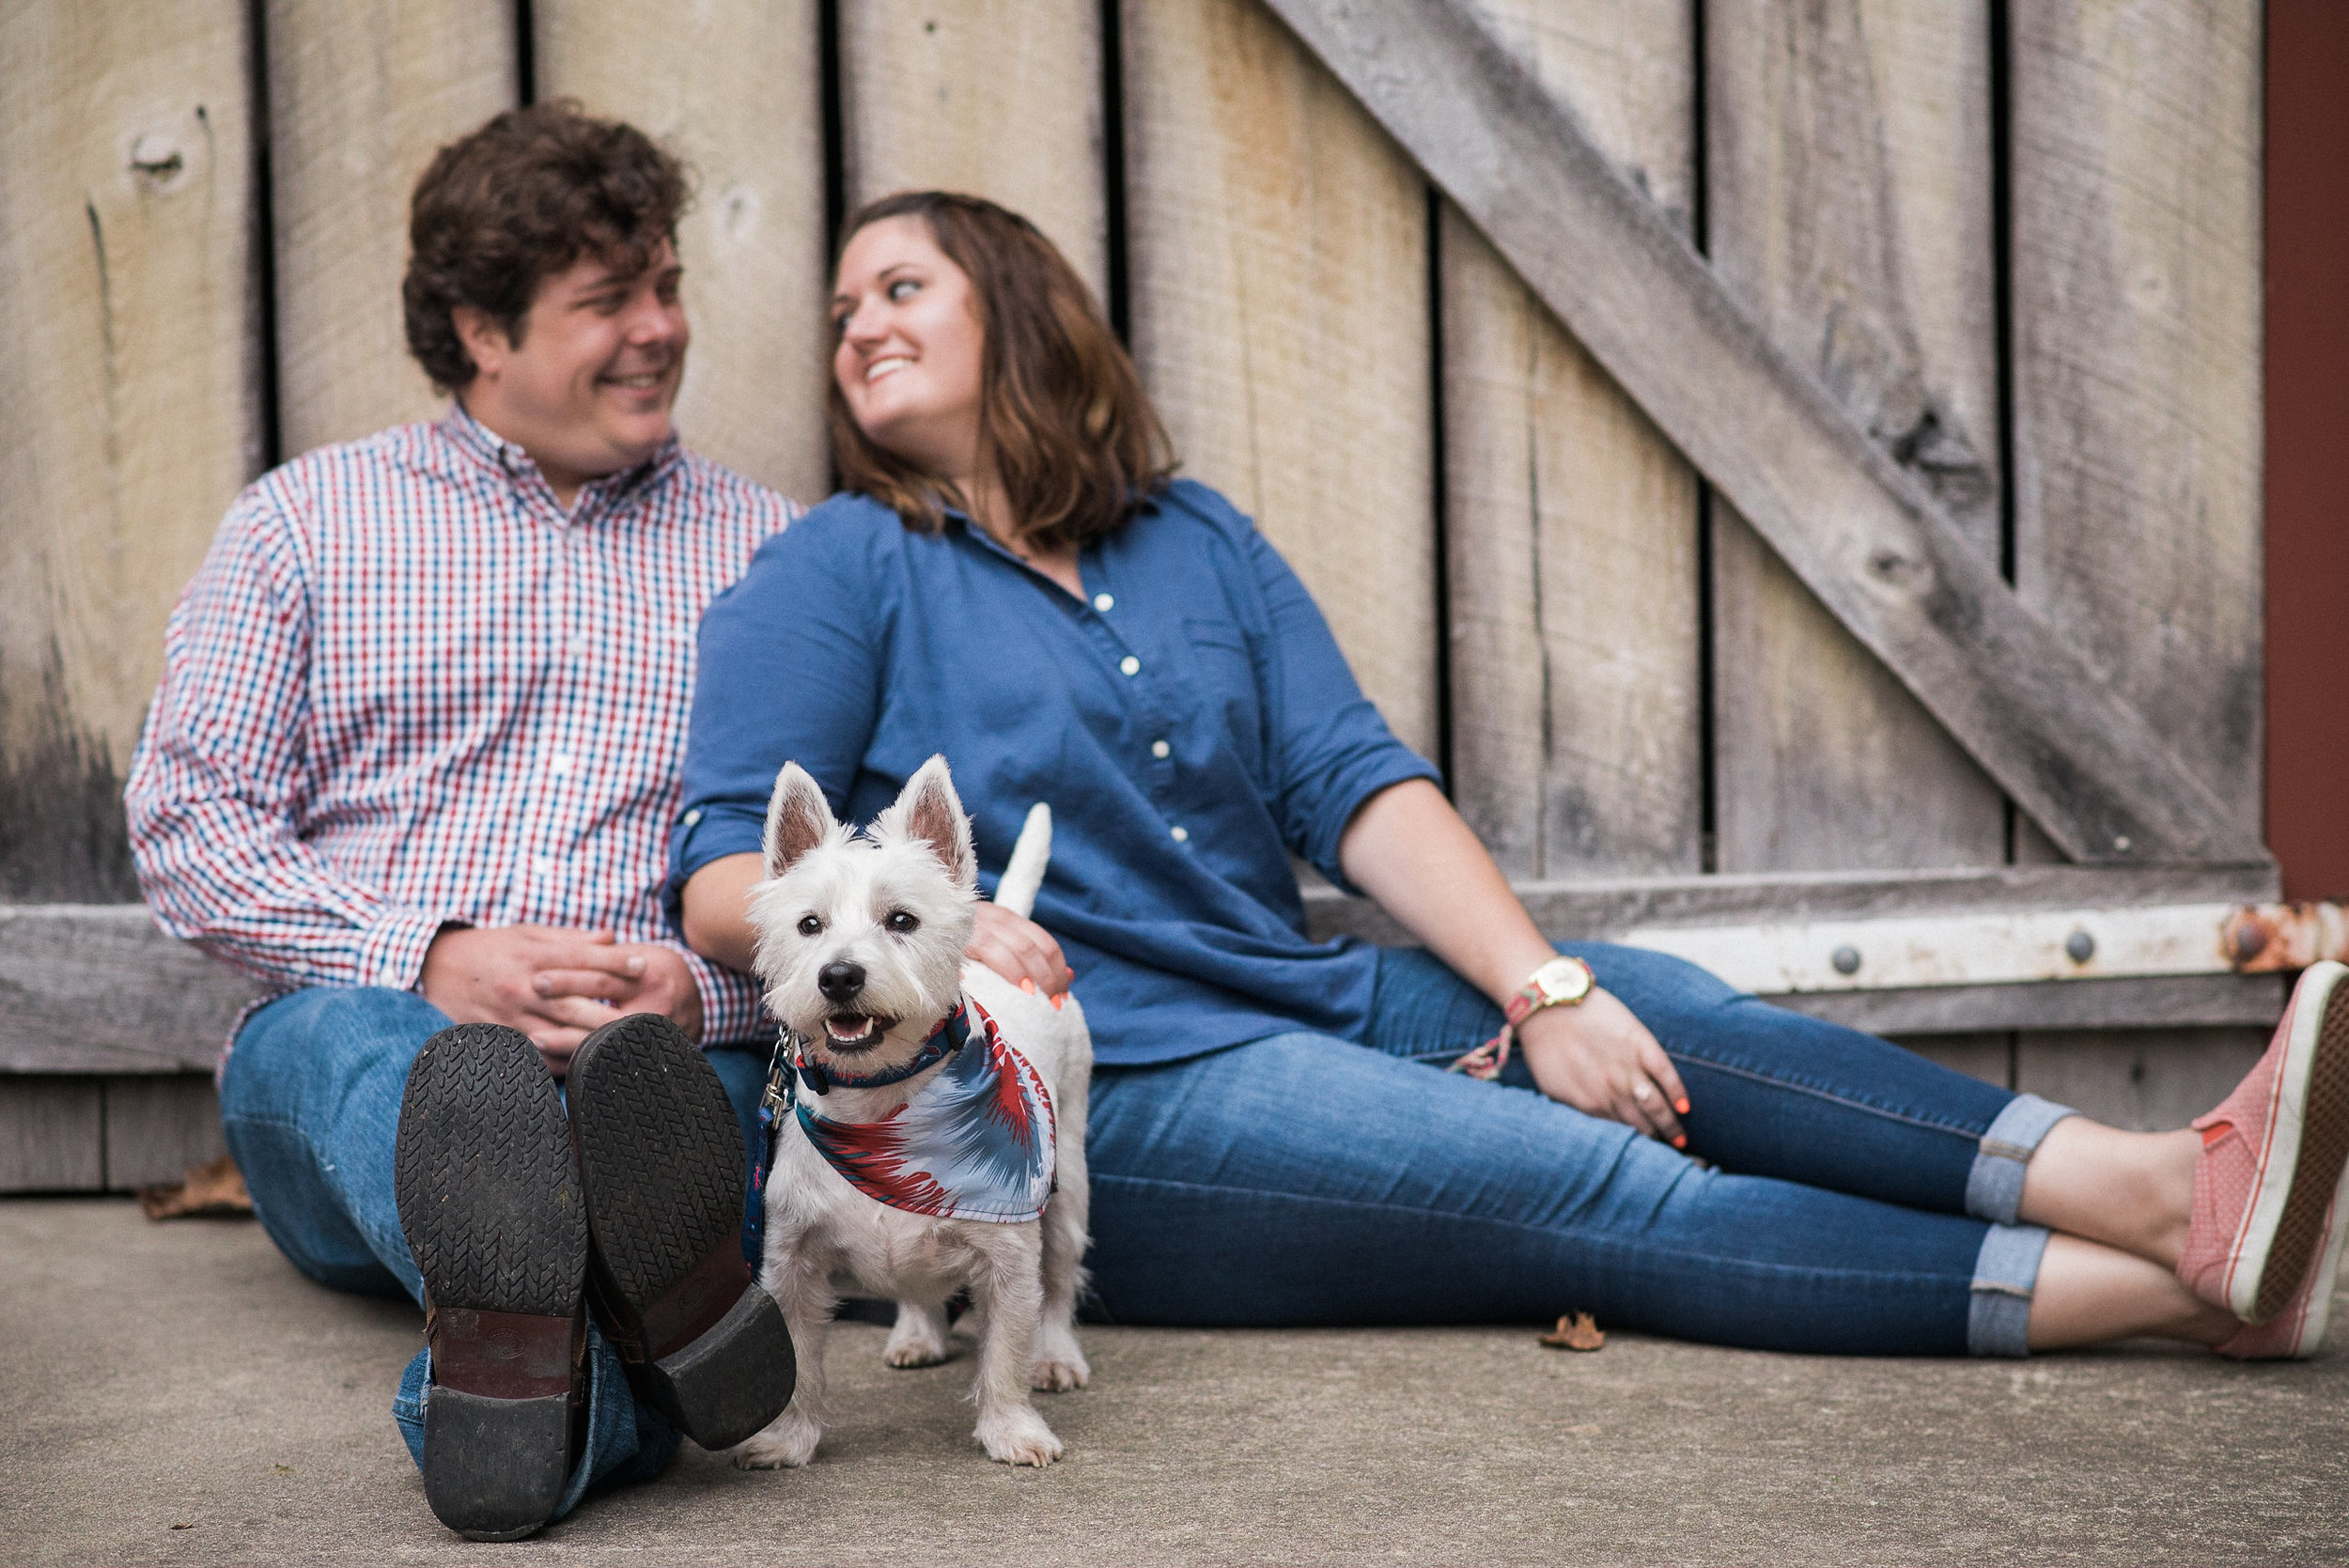 Couple sitting on ground with dog